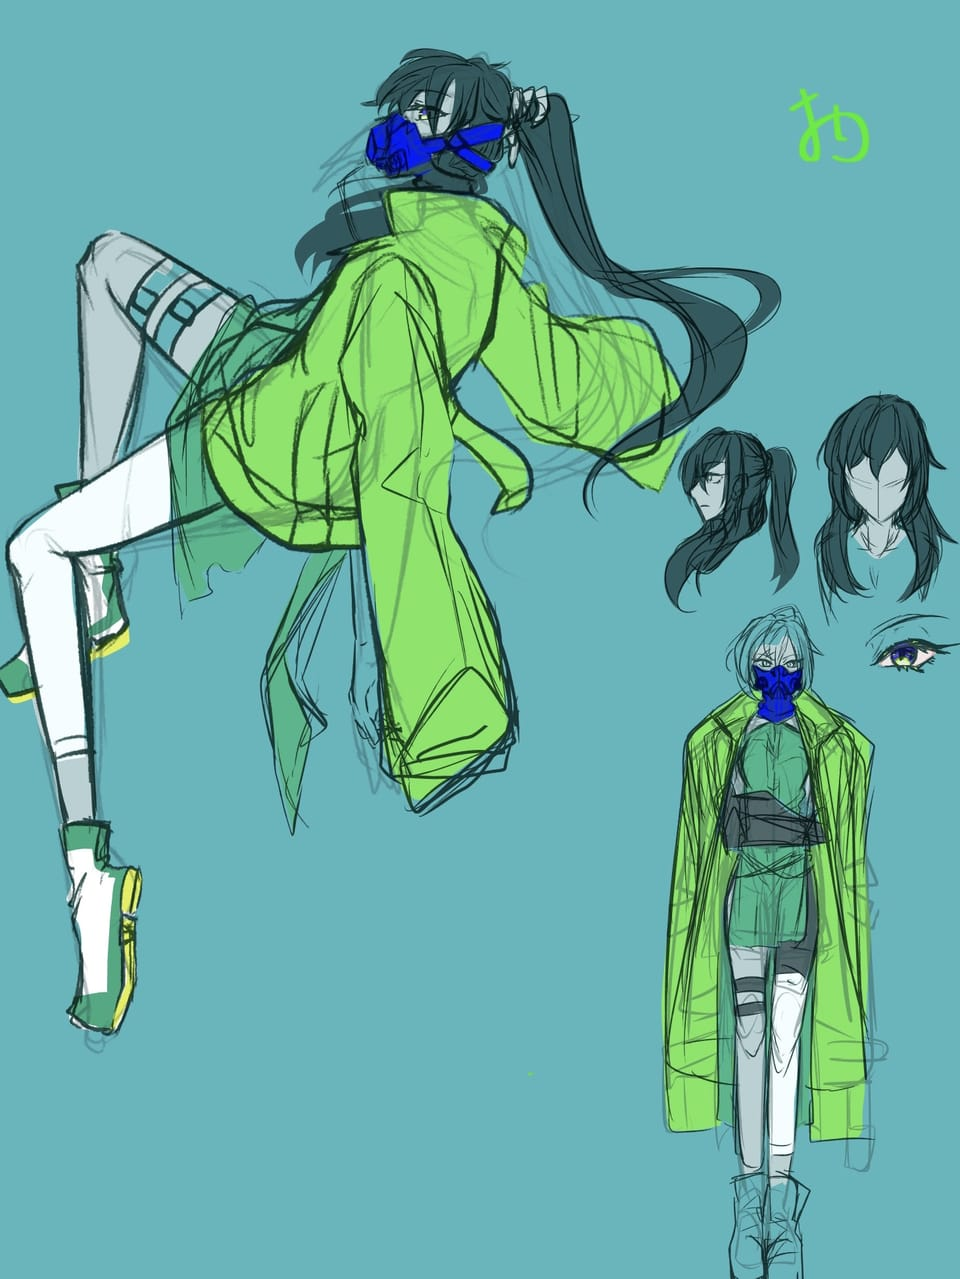 Illust of おり original girl medibangpaint doodle oc